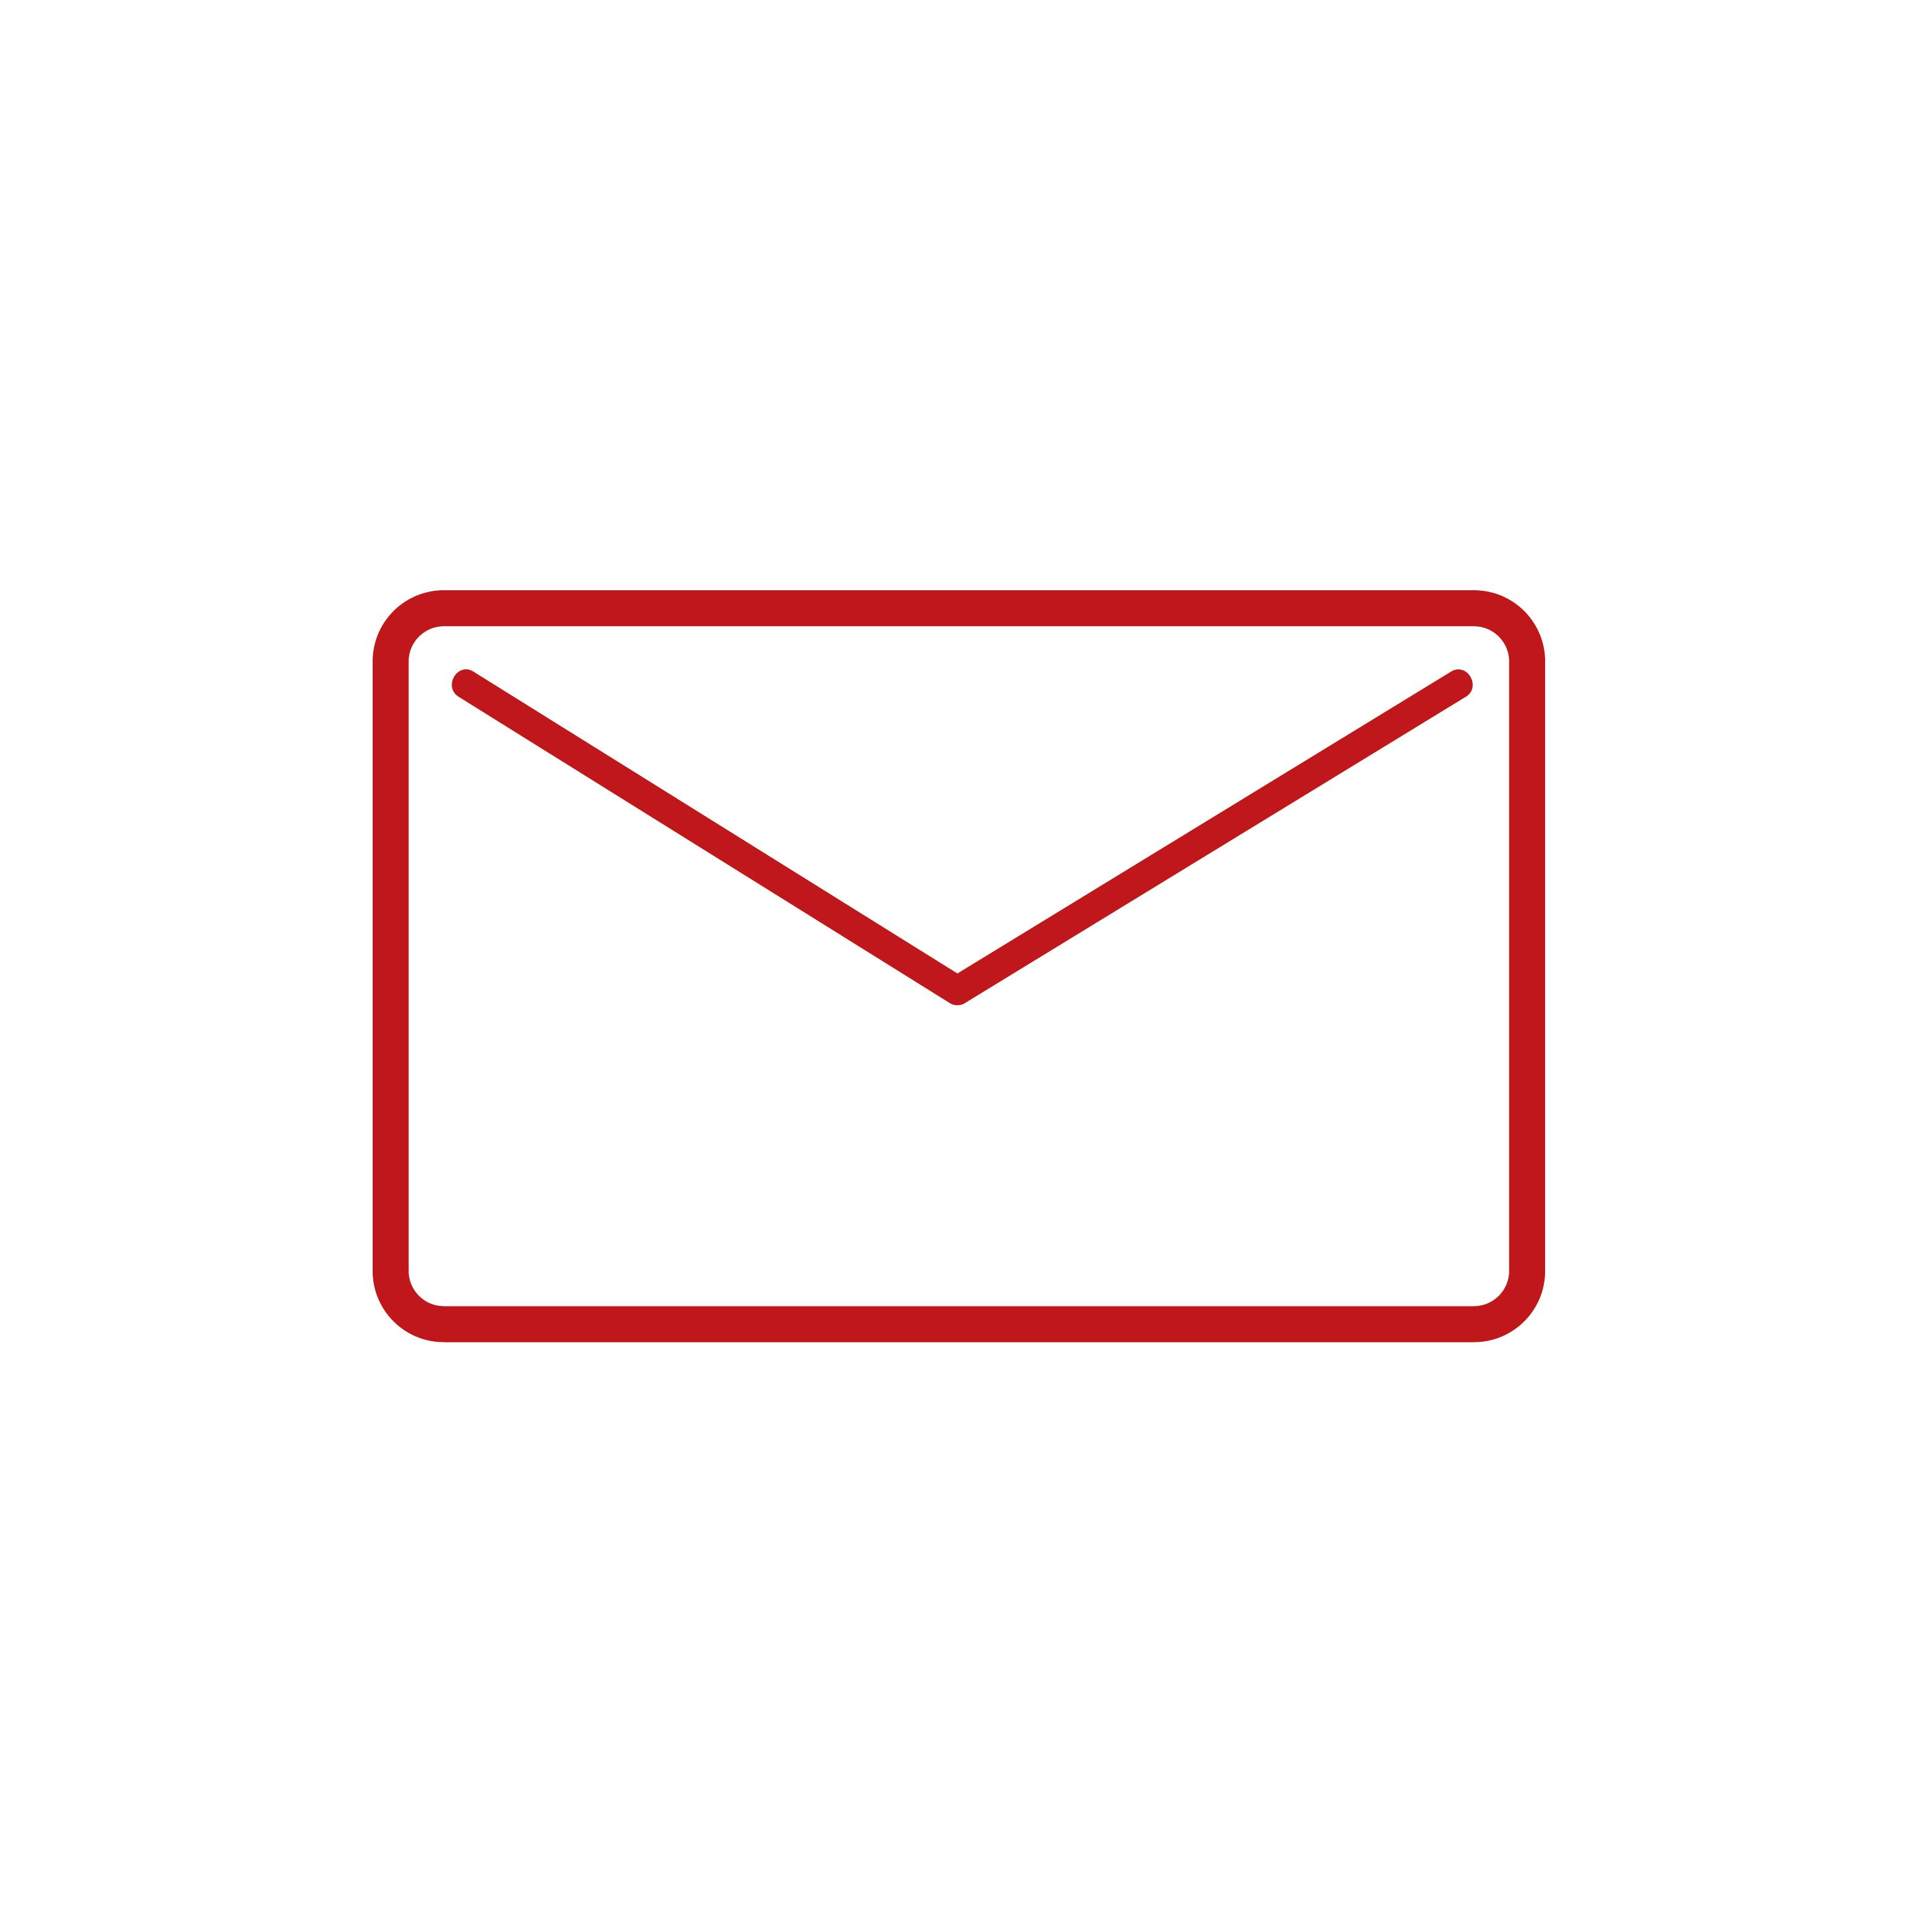 Kontakt-icon